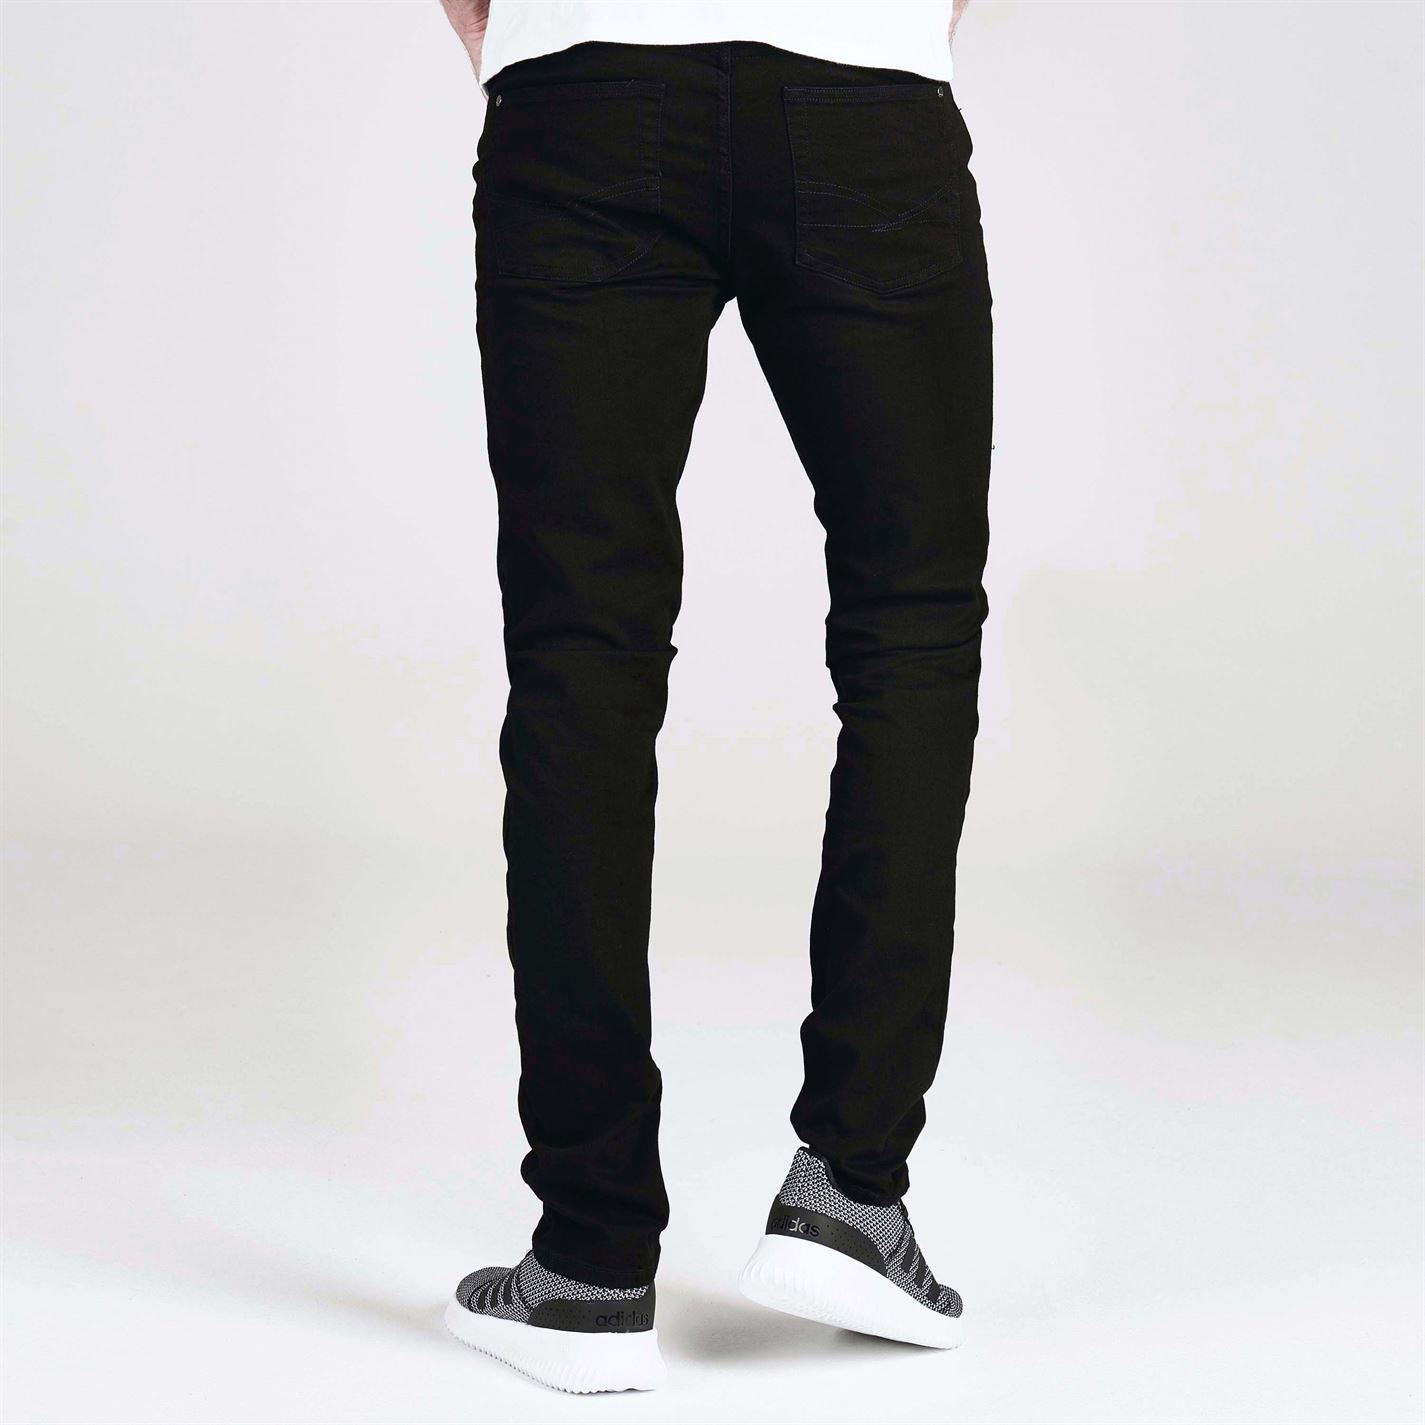 Jeans-Denim-Firetrap-Skinny-Mens-Trouser-Black thumbnail 20